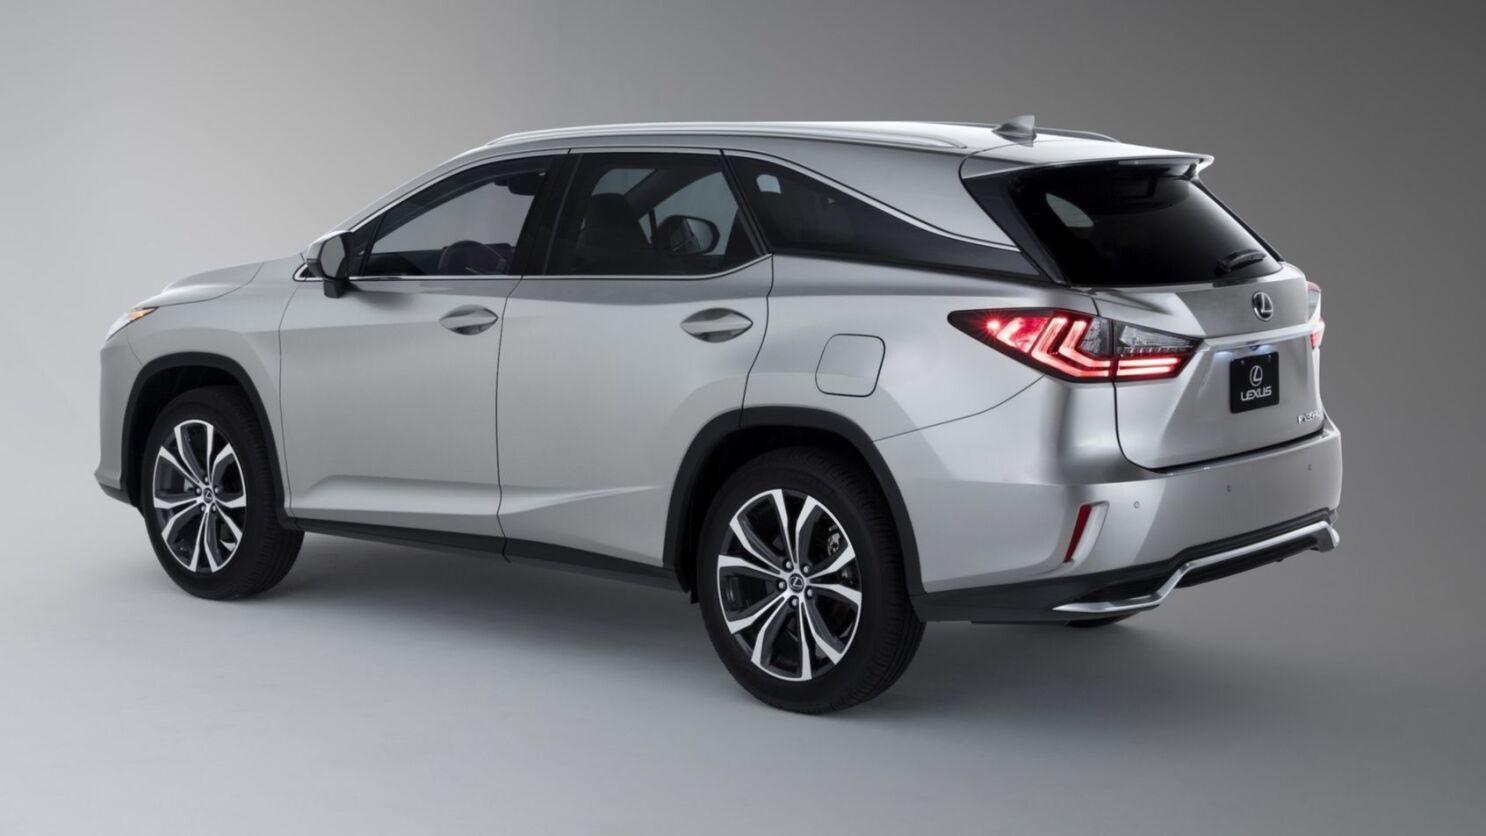 Lexus 3 Row Suv >> 2018 Lexus Rx 350l The 3 Row Prescription For Family Travel The